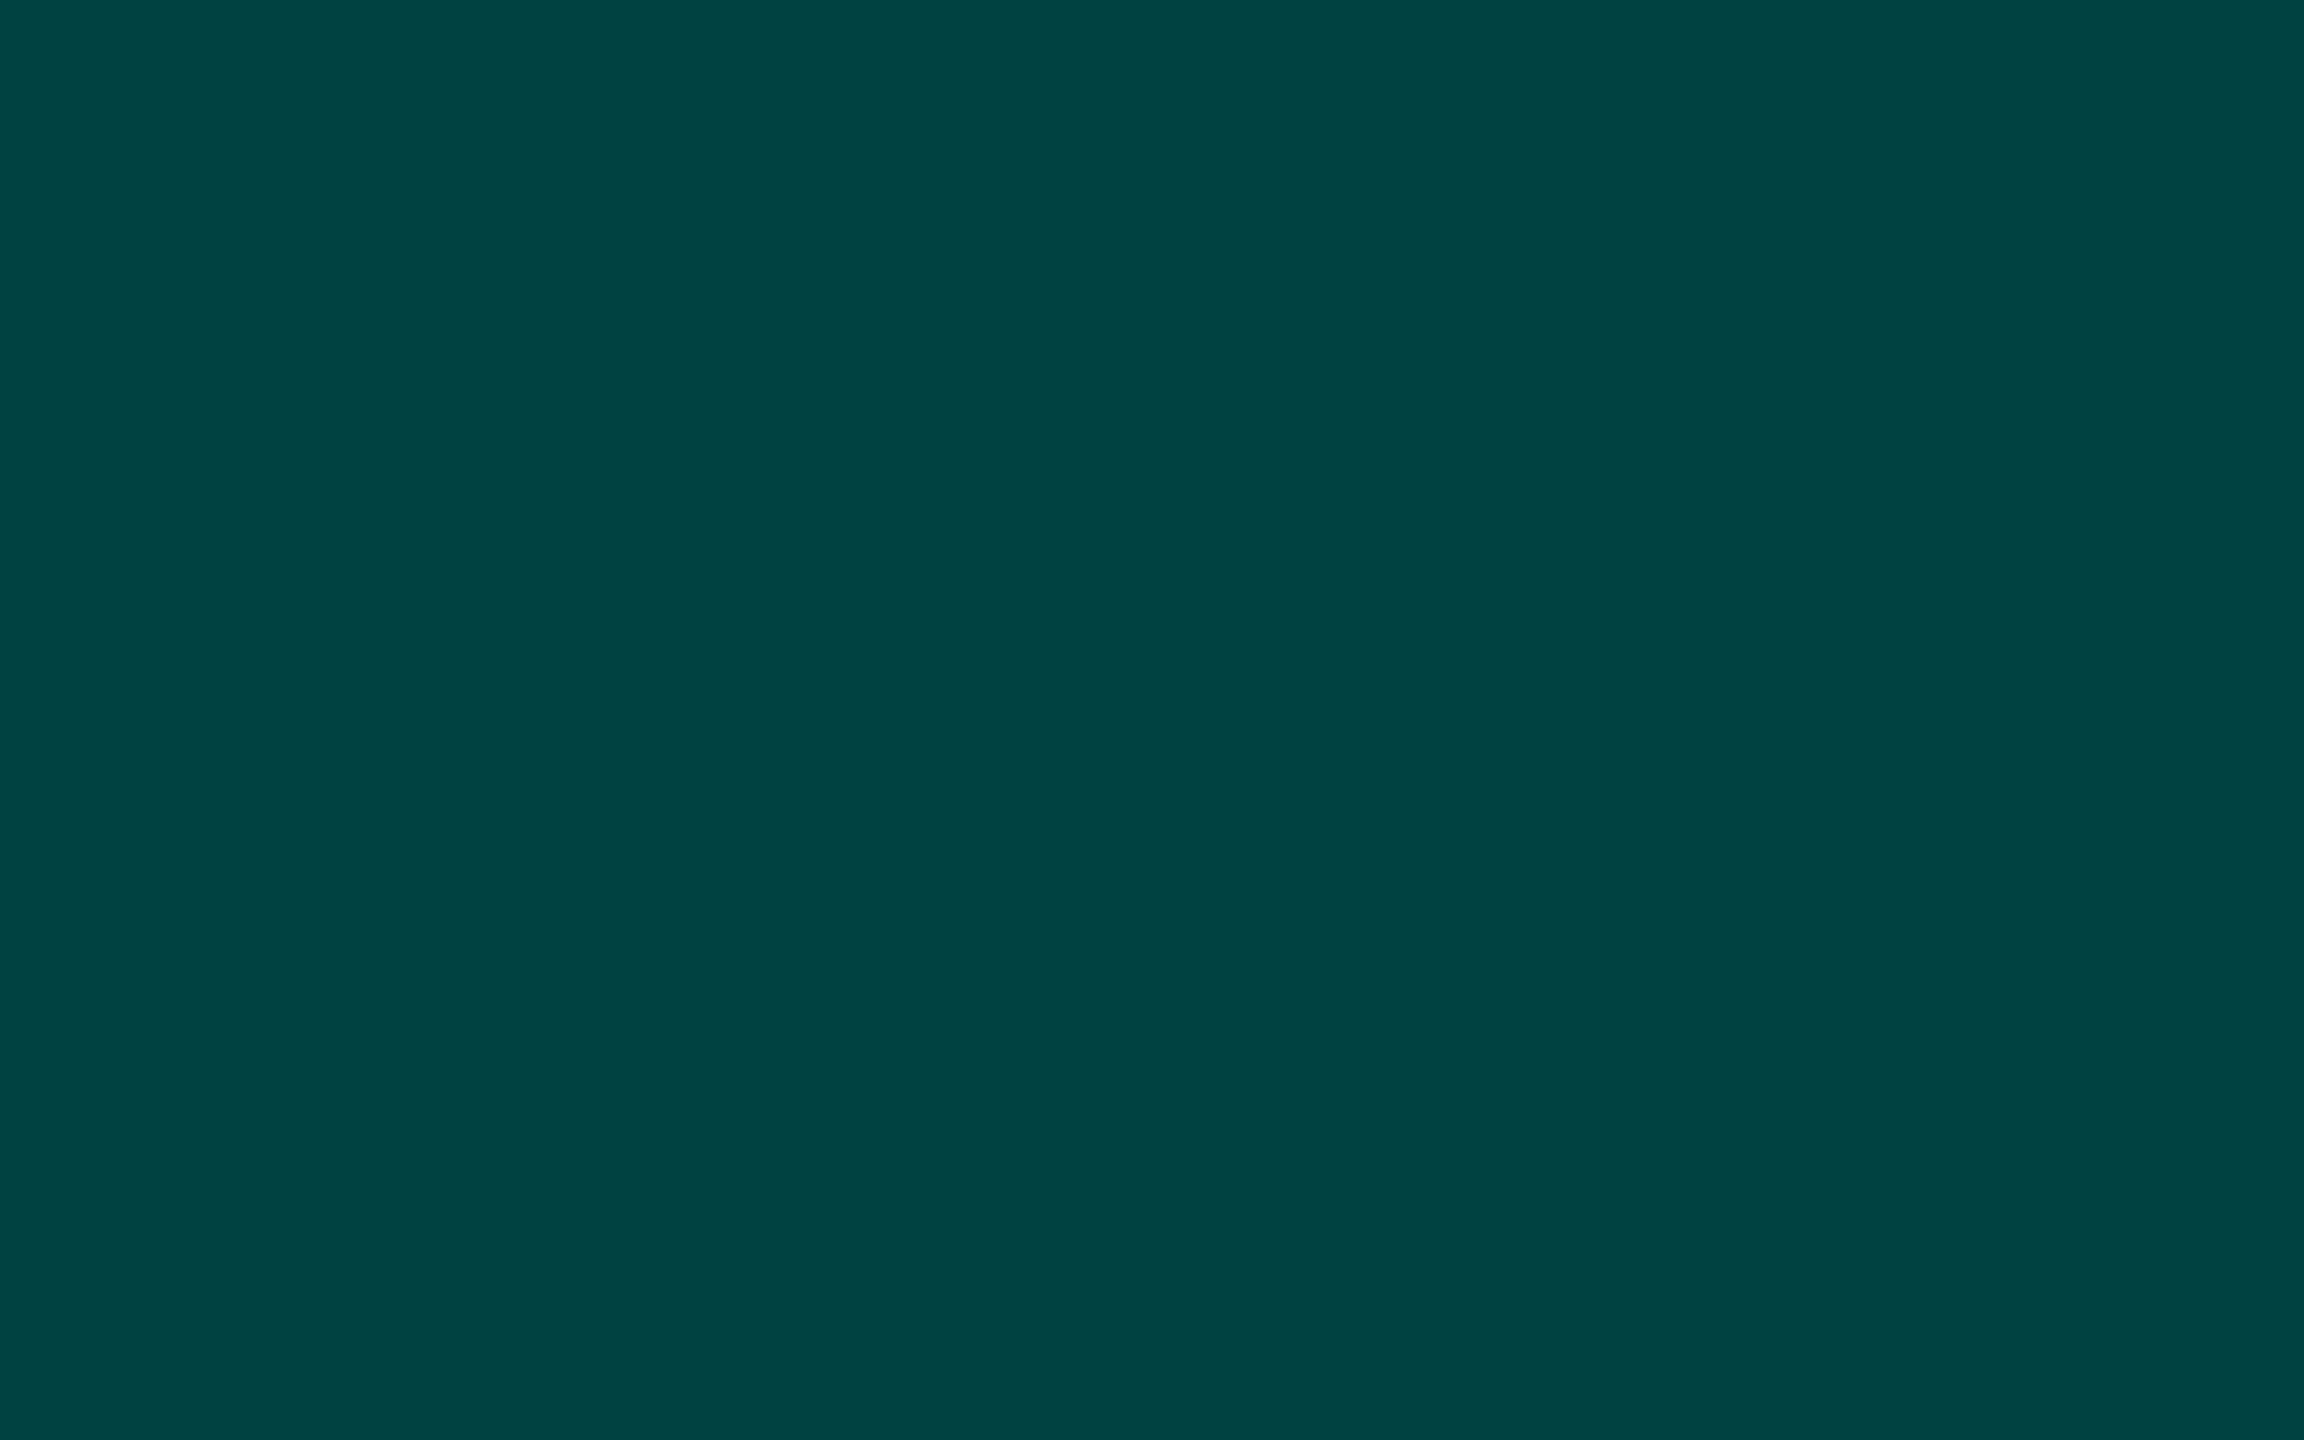 2304x1440 Warm Black Solid Color Background